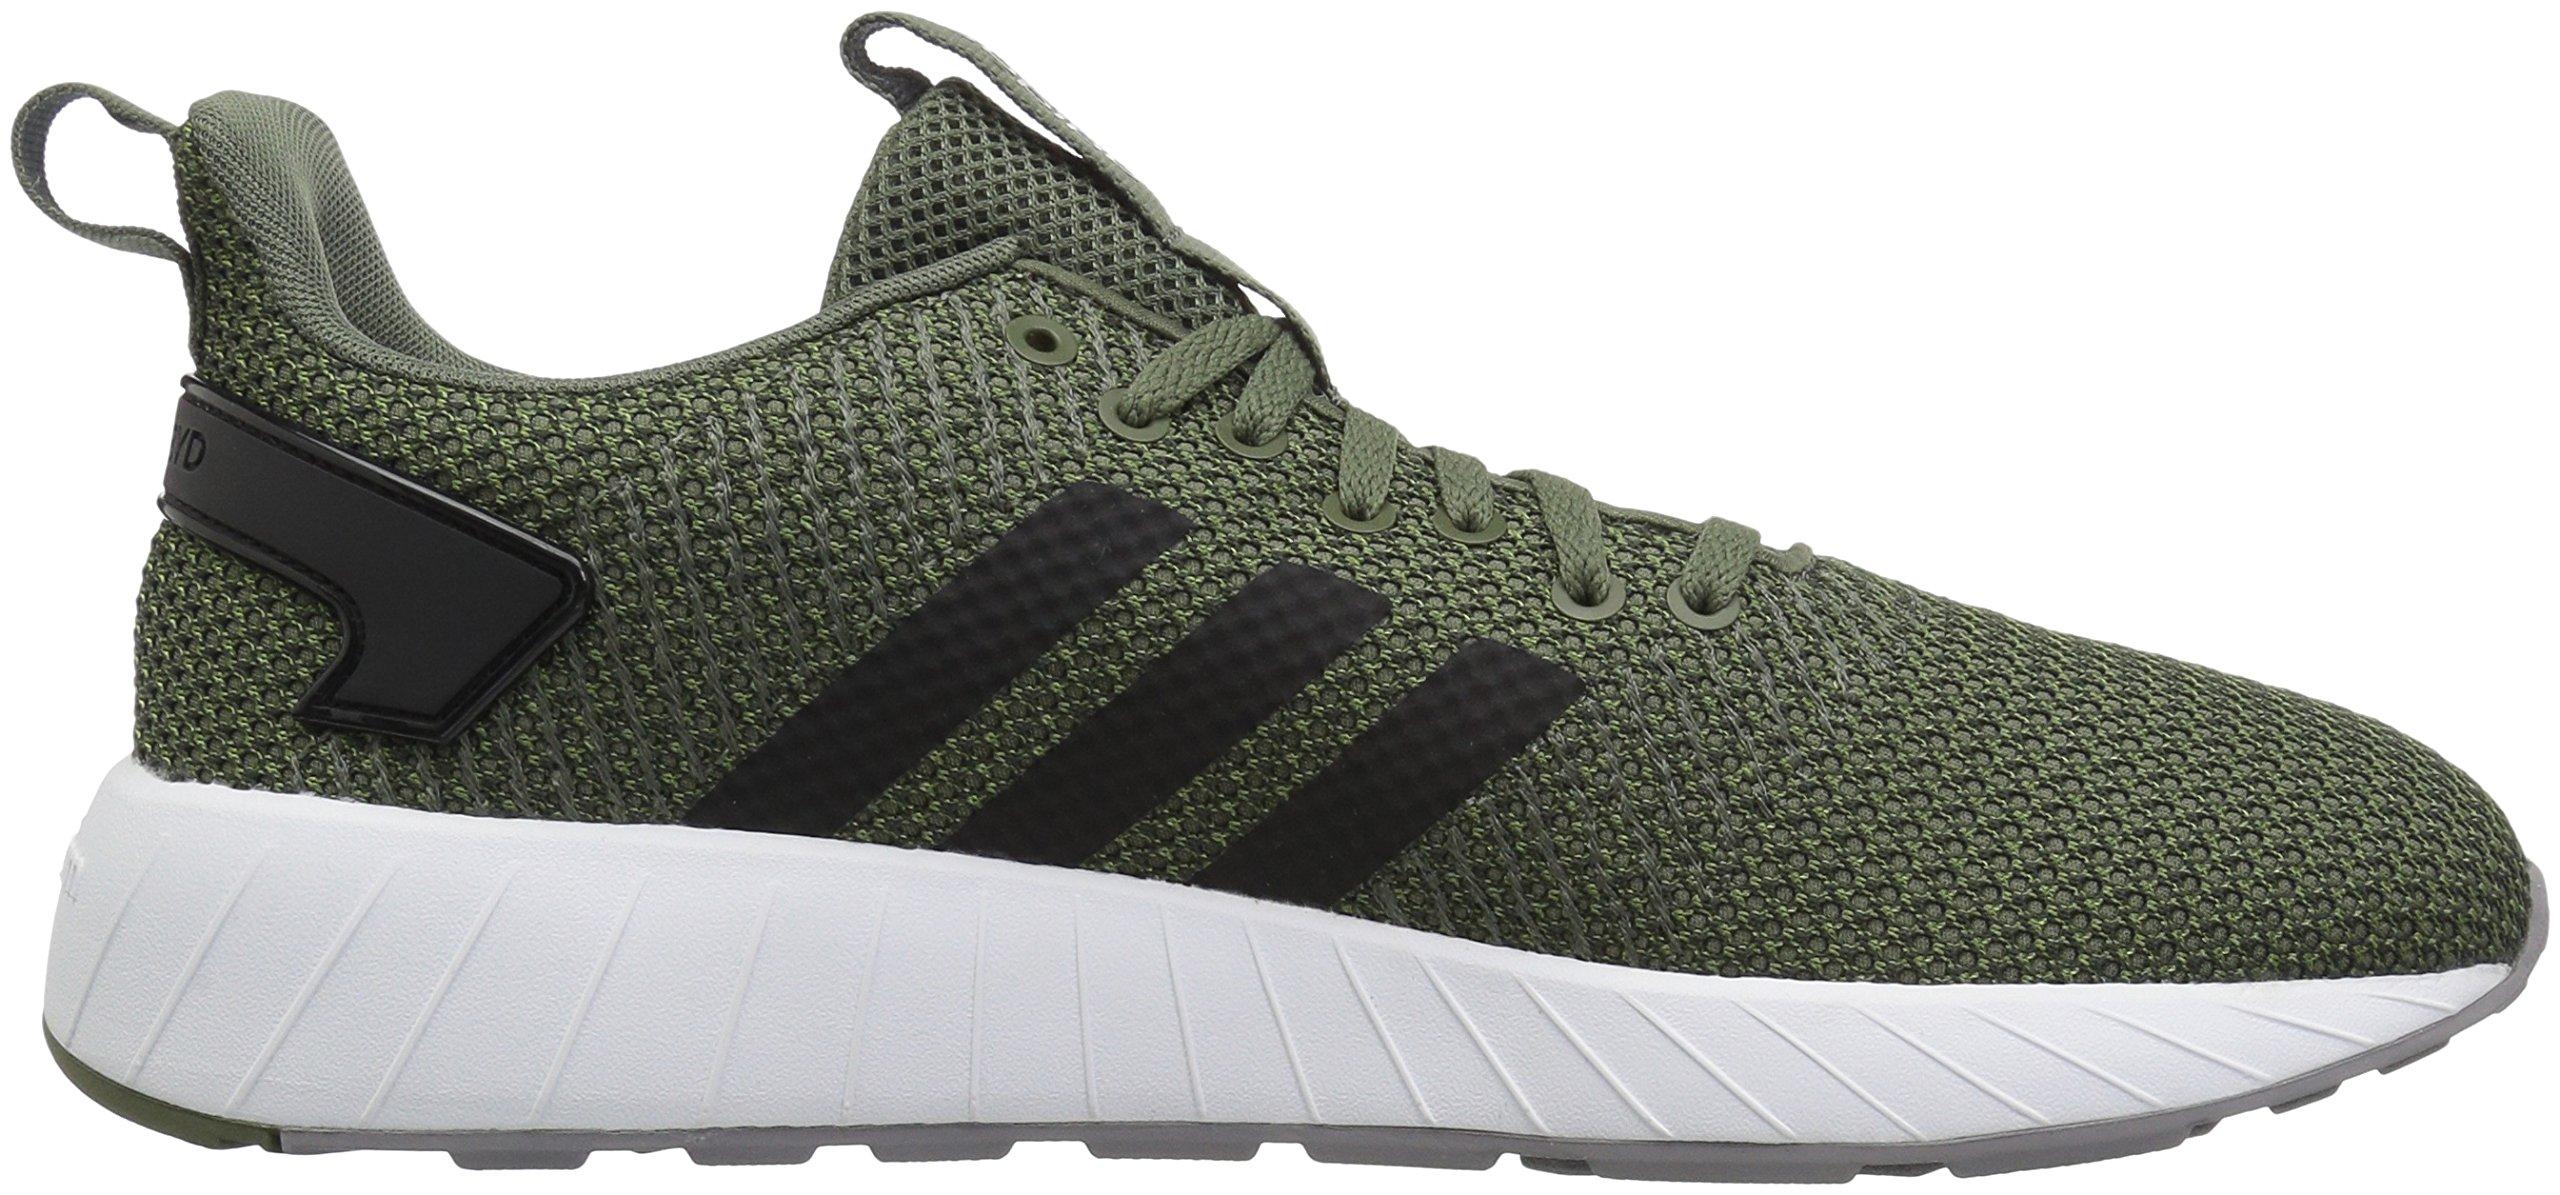 adidas Men's Questar BYD Running Shoe, Base Green/Black/Grey, 6.5 M US by adidas (Image #6)